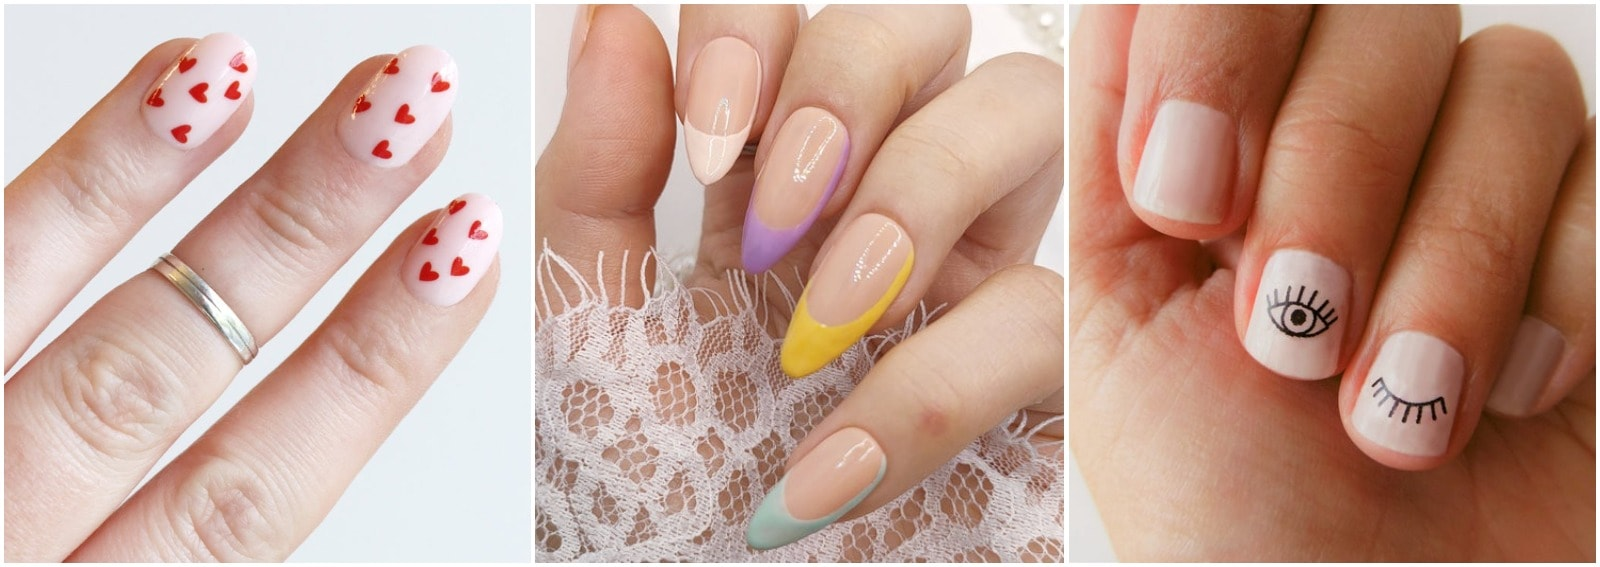 unghie estive 2021 semplici nail art facili cover desktop